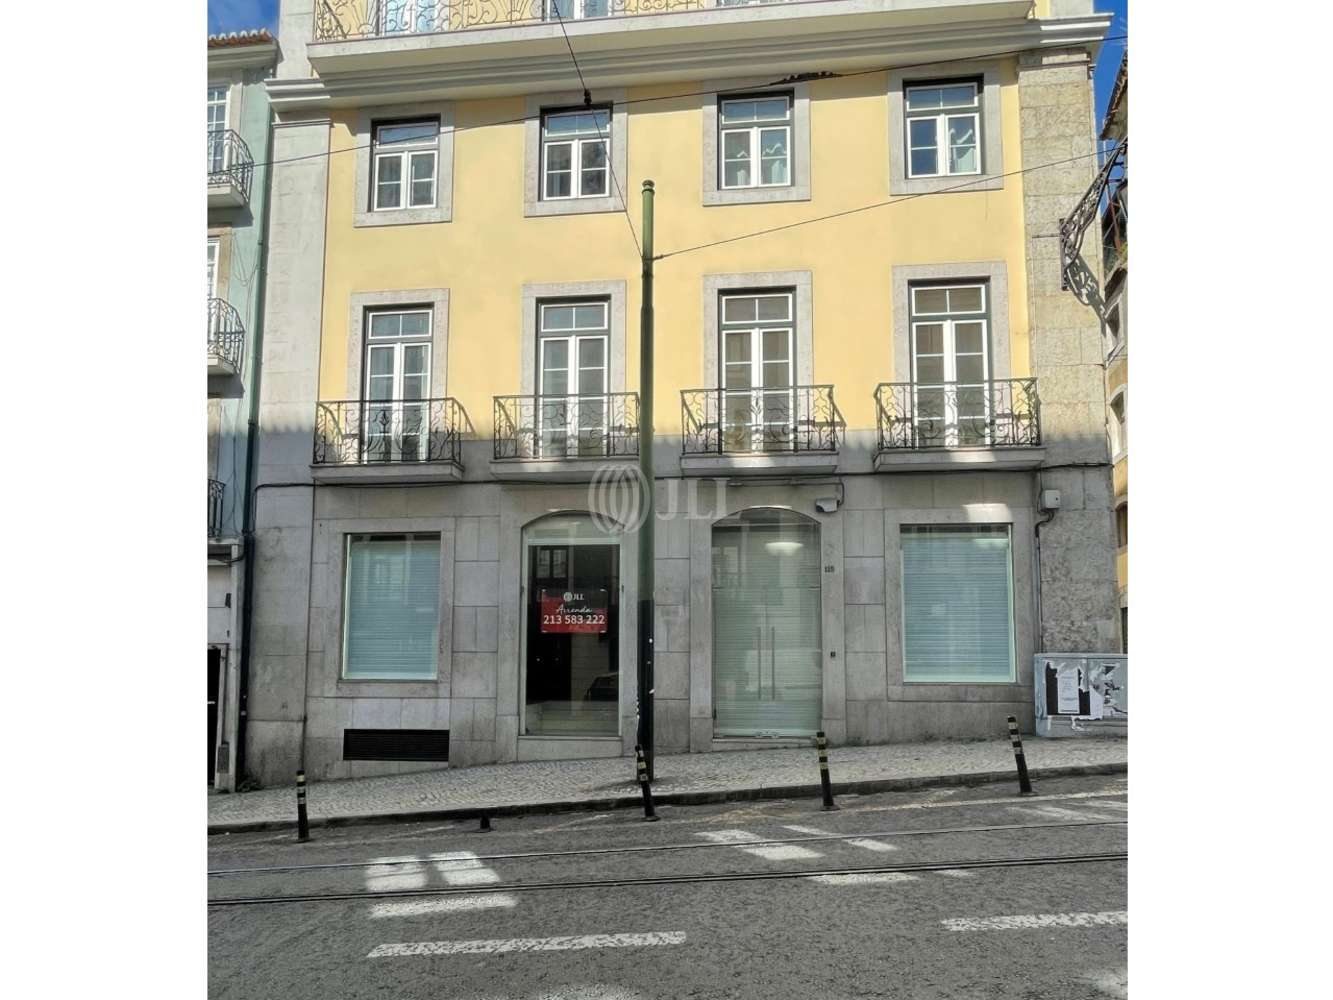 Loja Lisboa,  - Loja na Rua da Misericórdia 111-117